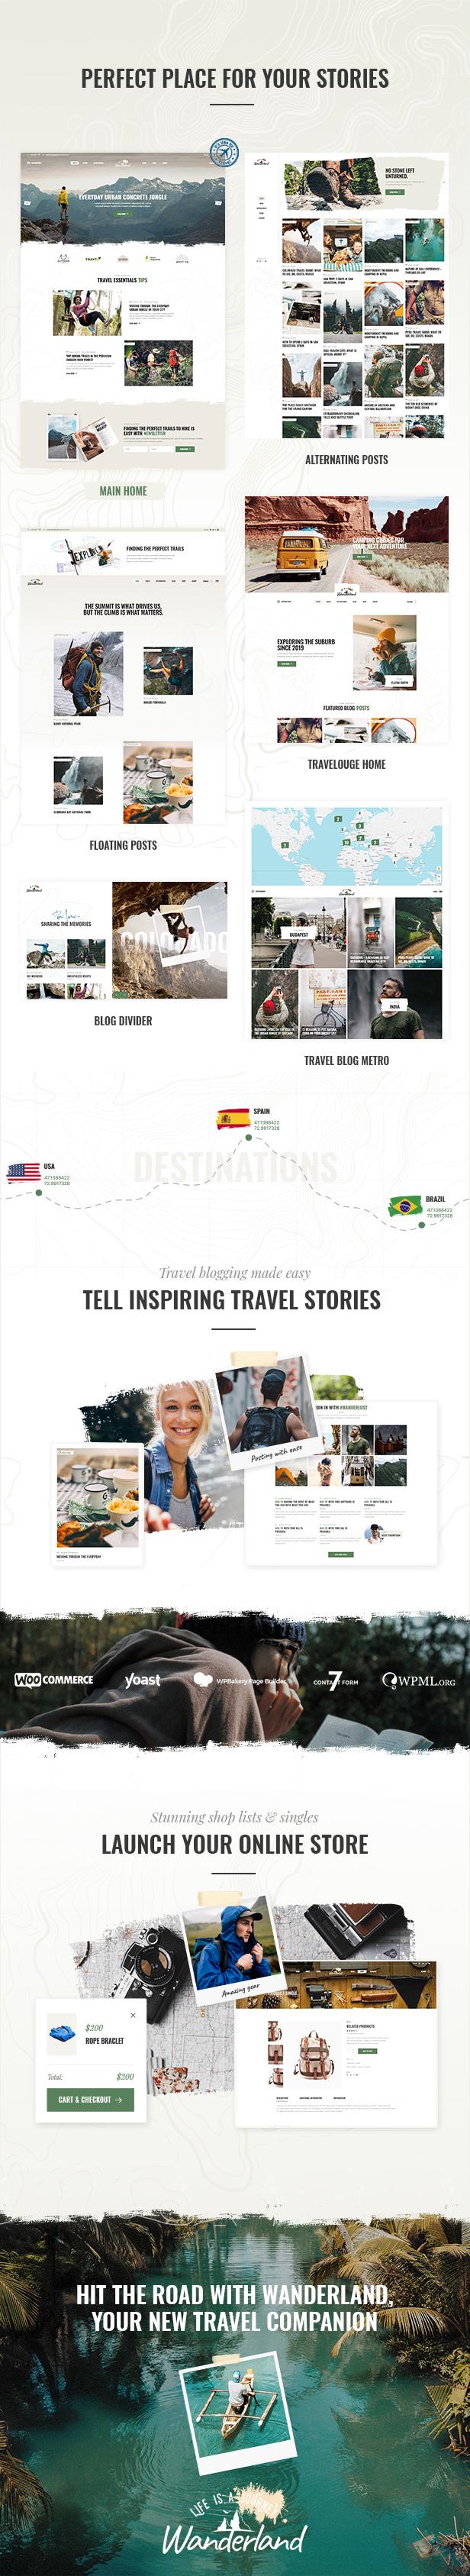 Wanderland - Travel Blog - 2